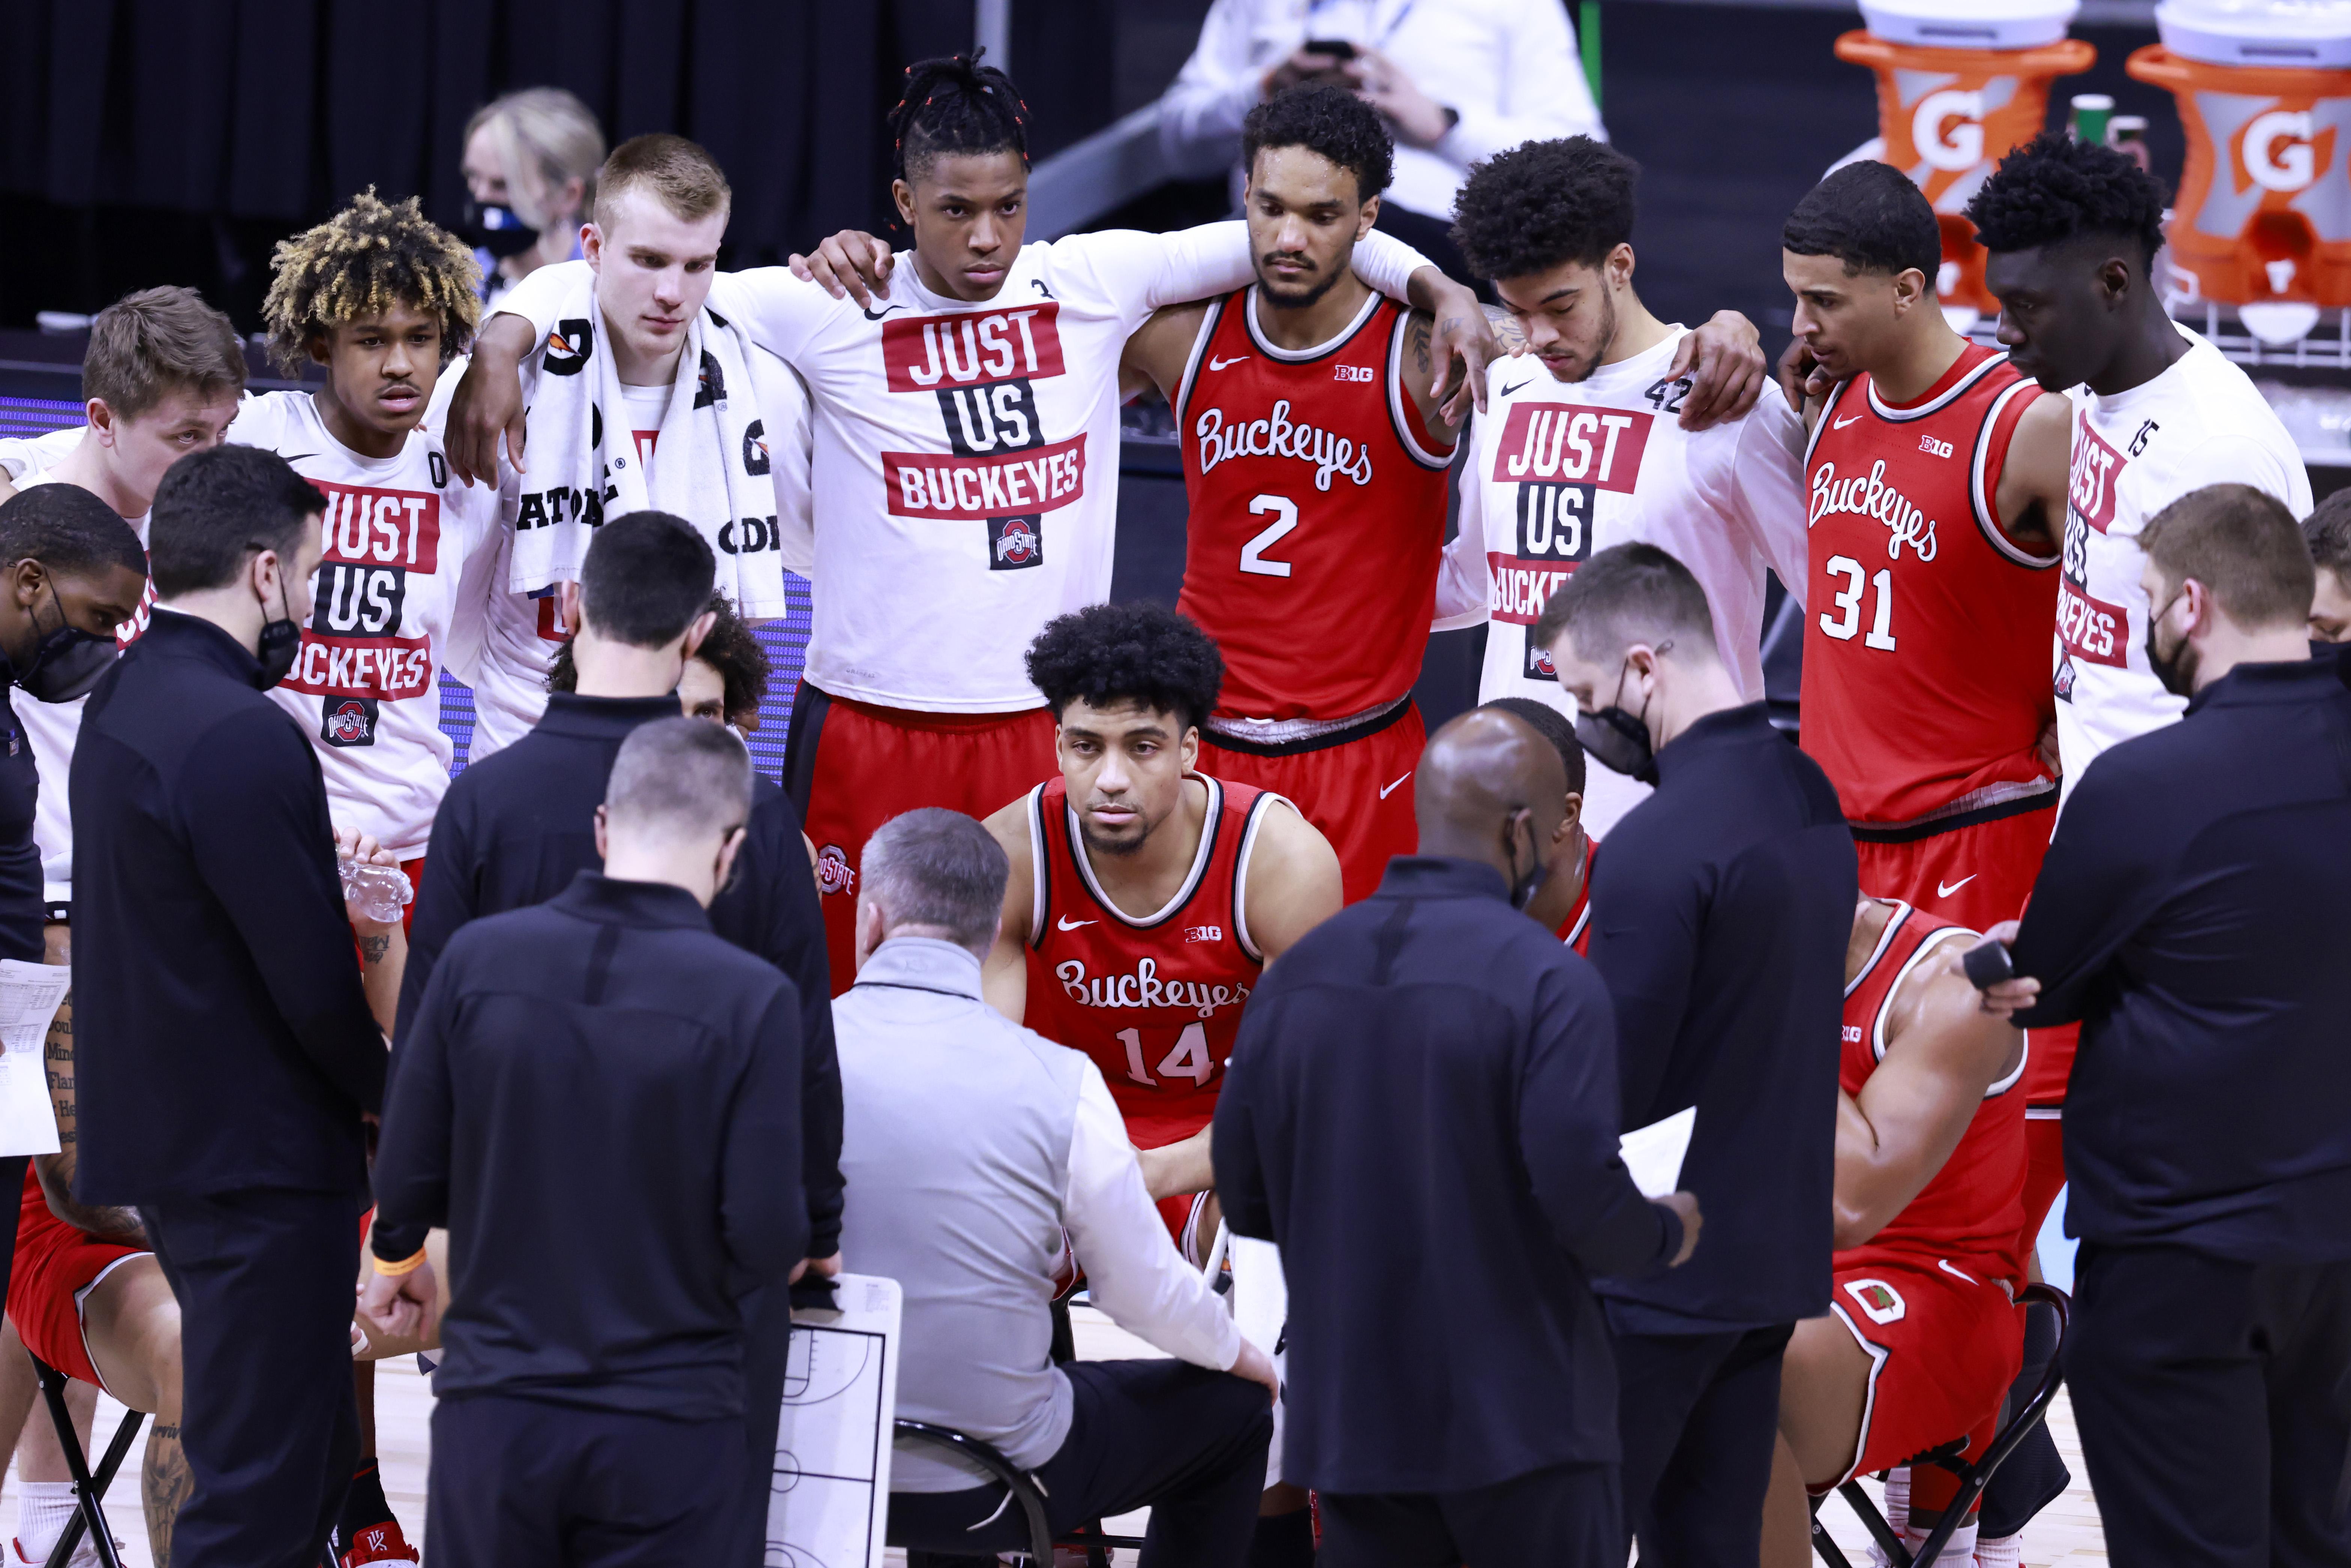 Big Ten Men's Basketball Tournament - Ohio State v Michigan